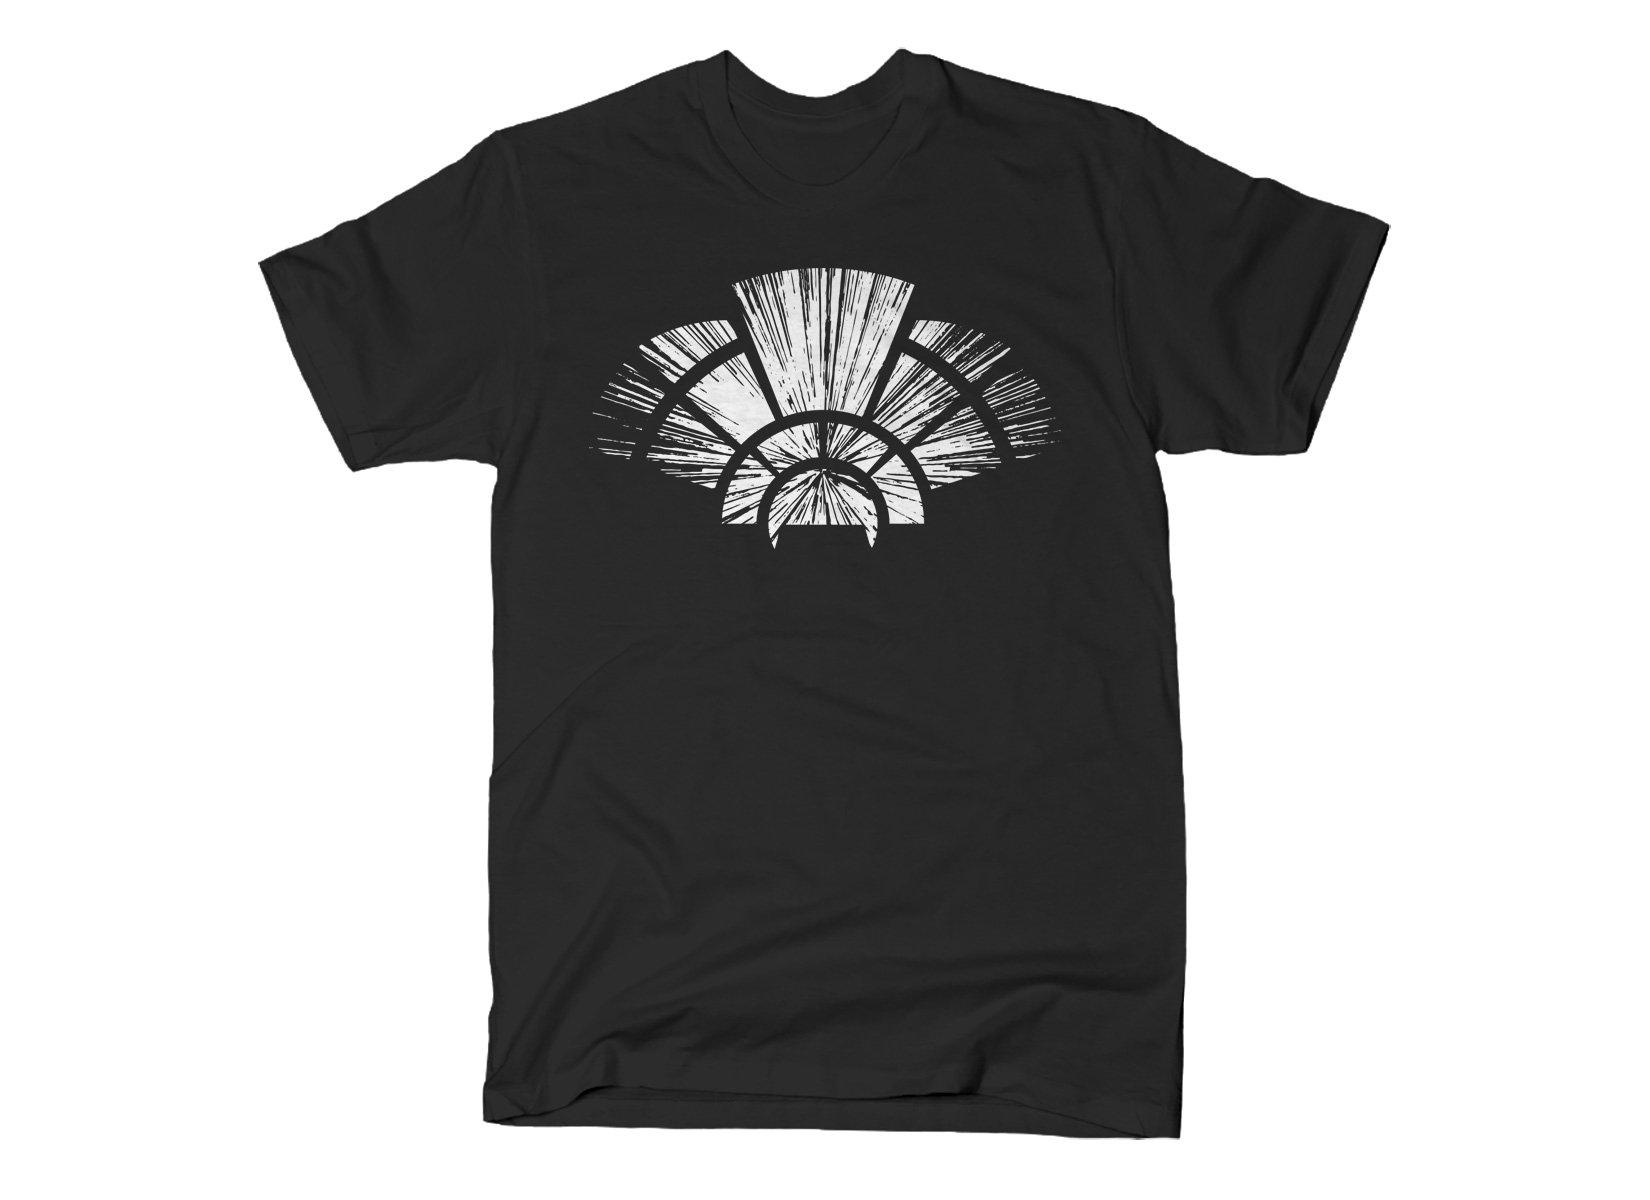 Hyperdrive on Mens T-Shirt